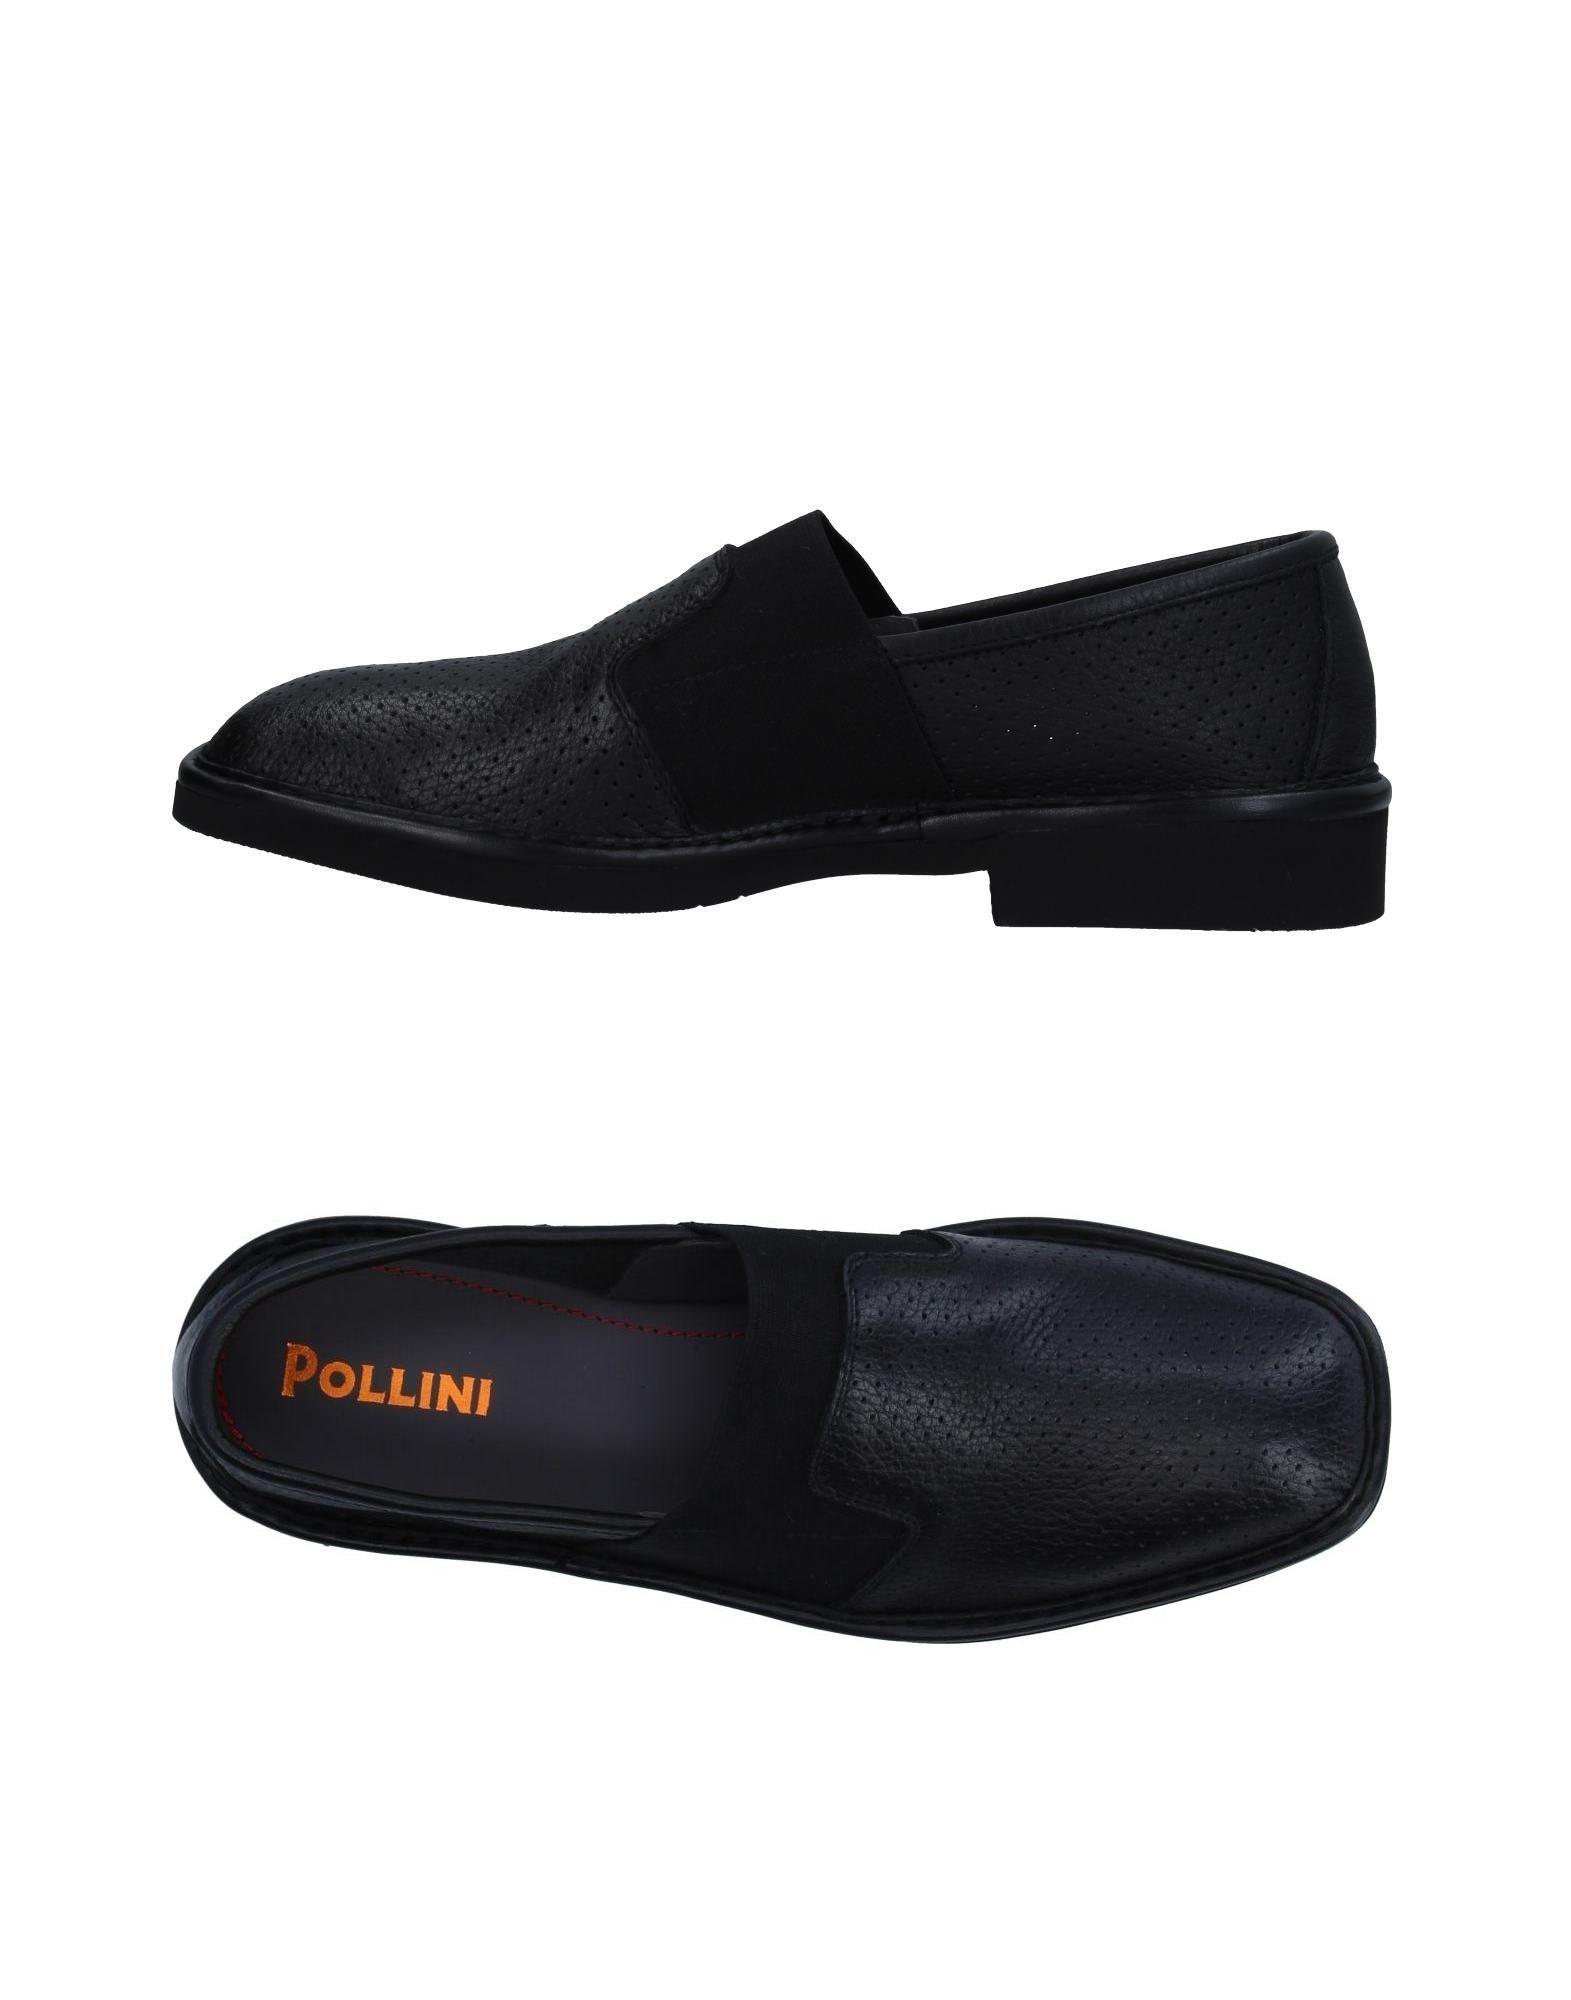 Pollini Mokassins Gute Herren  11331446DL Gute Mokassins Qualität beliebte Schuhe 3c466b